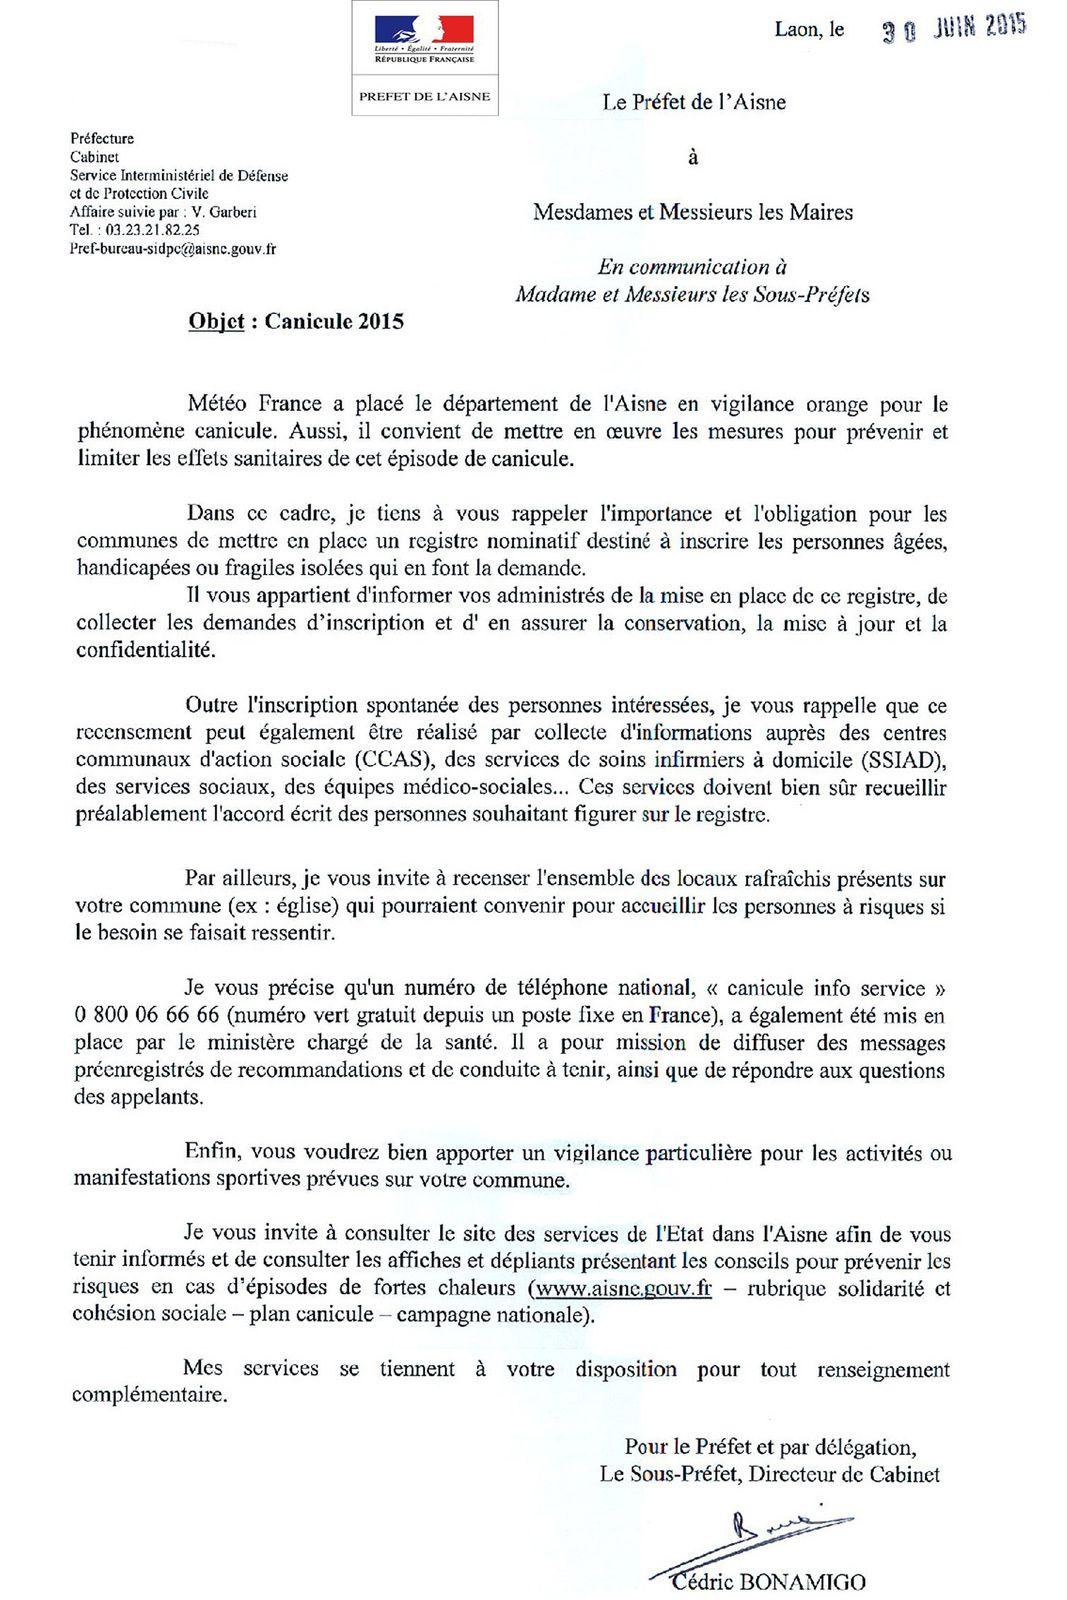 Info Mairie, alerte canicule du 1er Juillet 12h au 4 Juillet minuit.